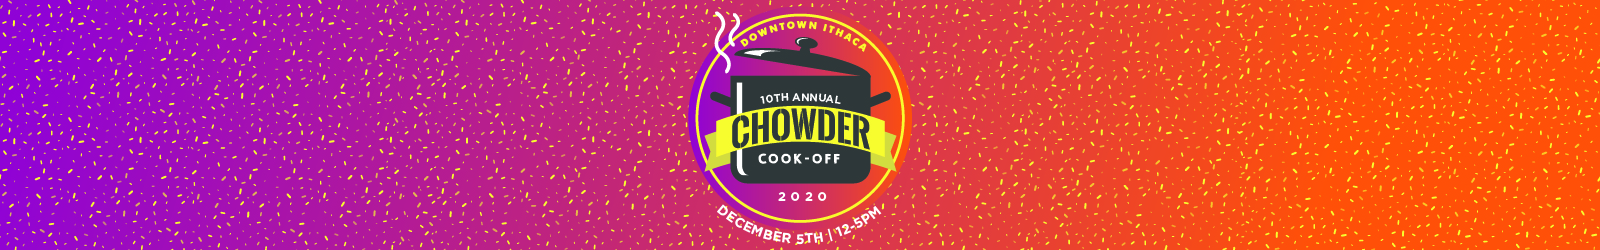 Chowder Cook-Off Header Image